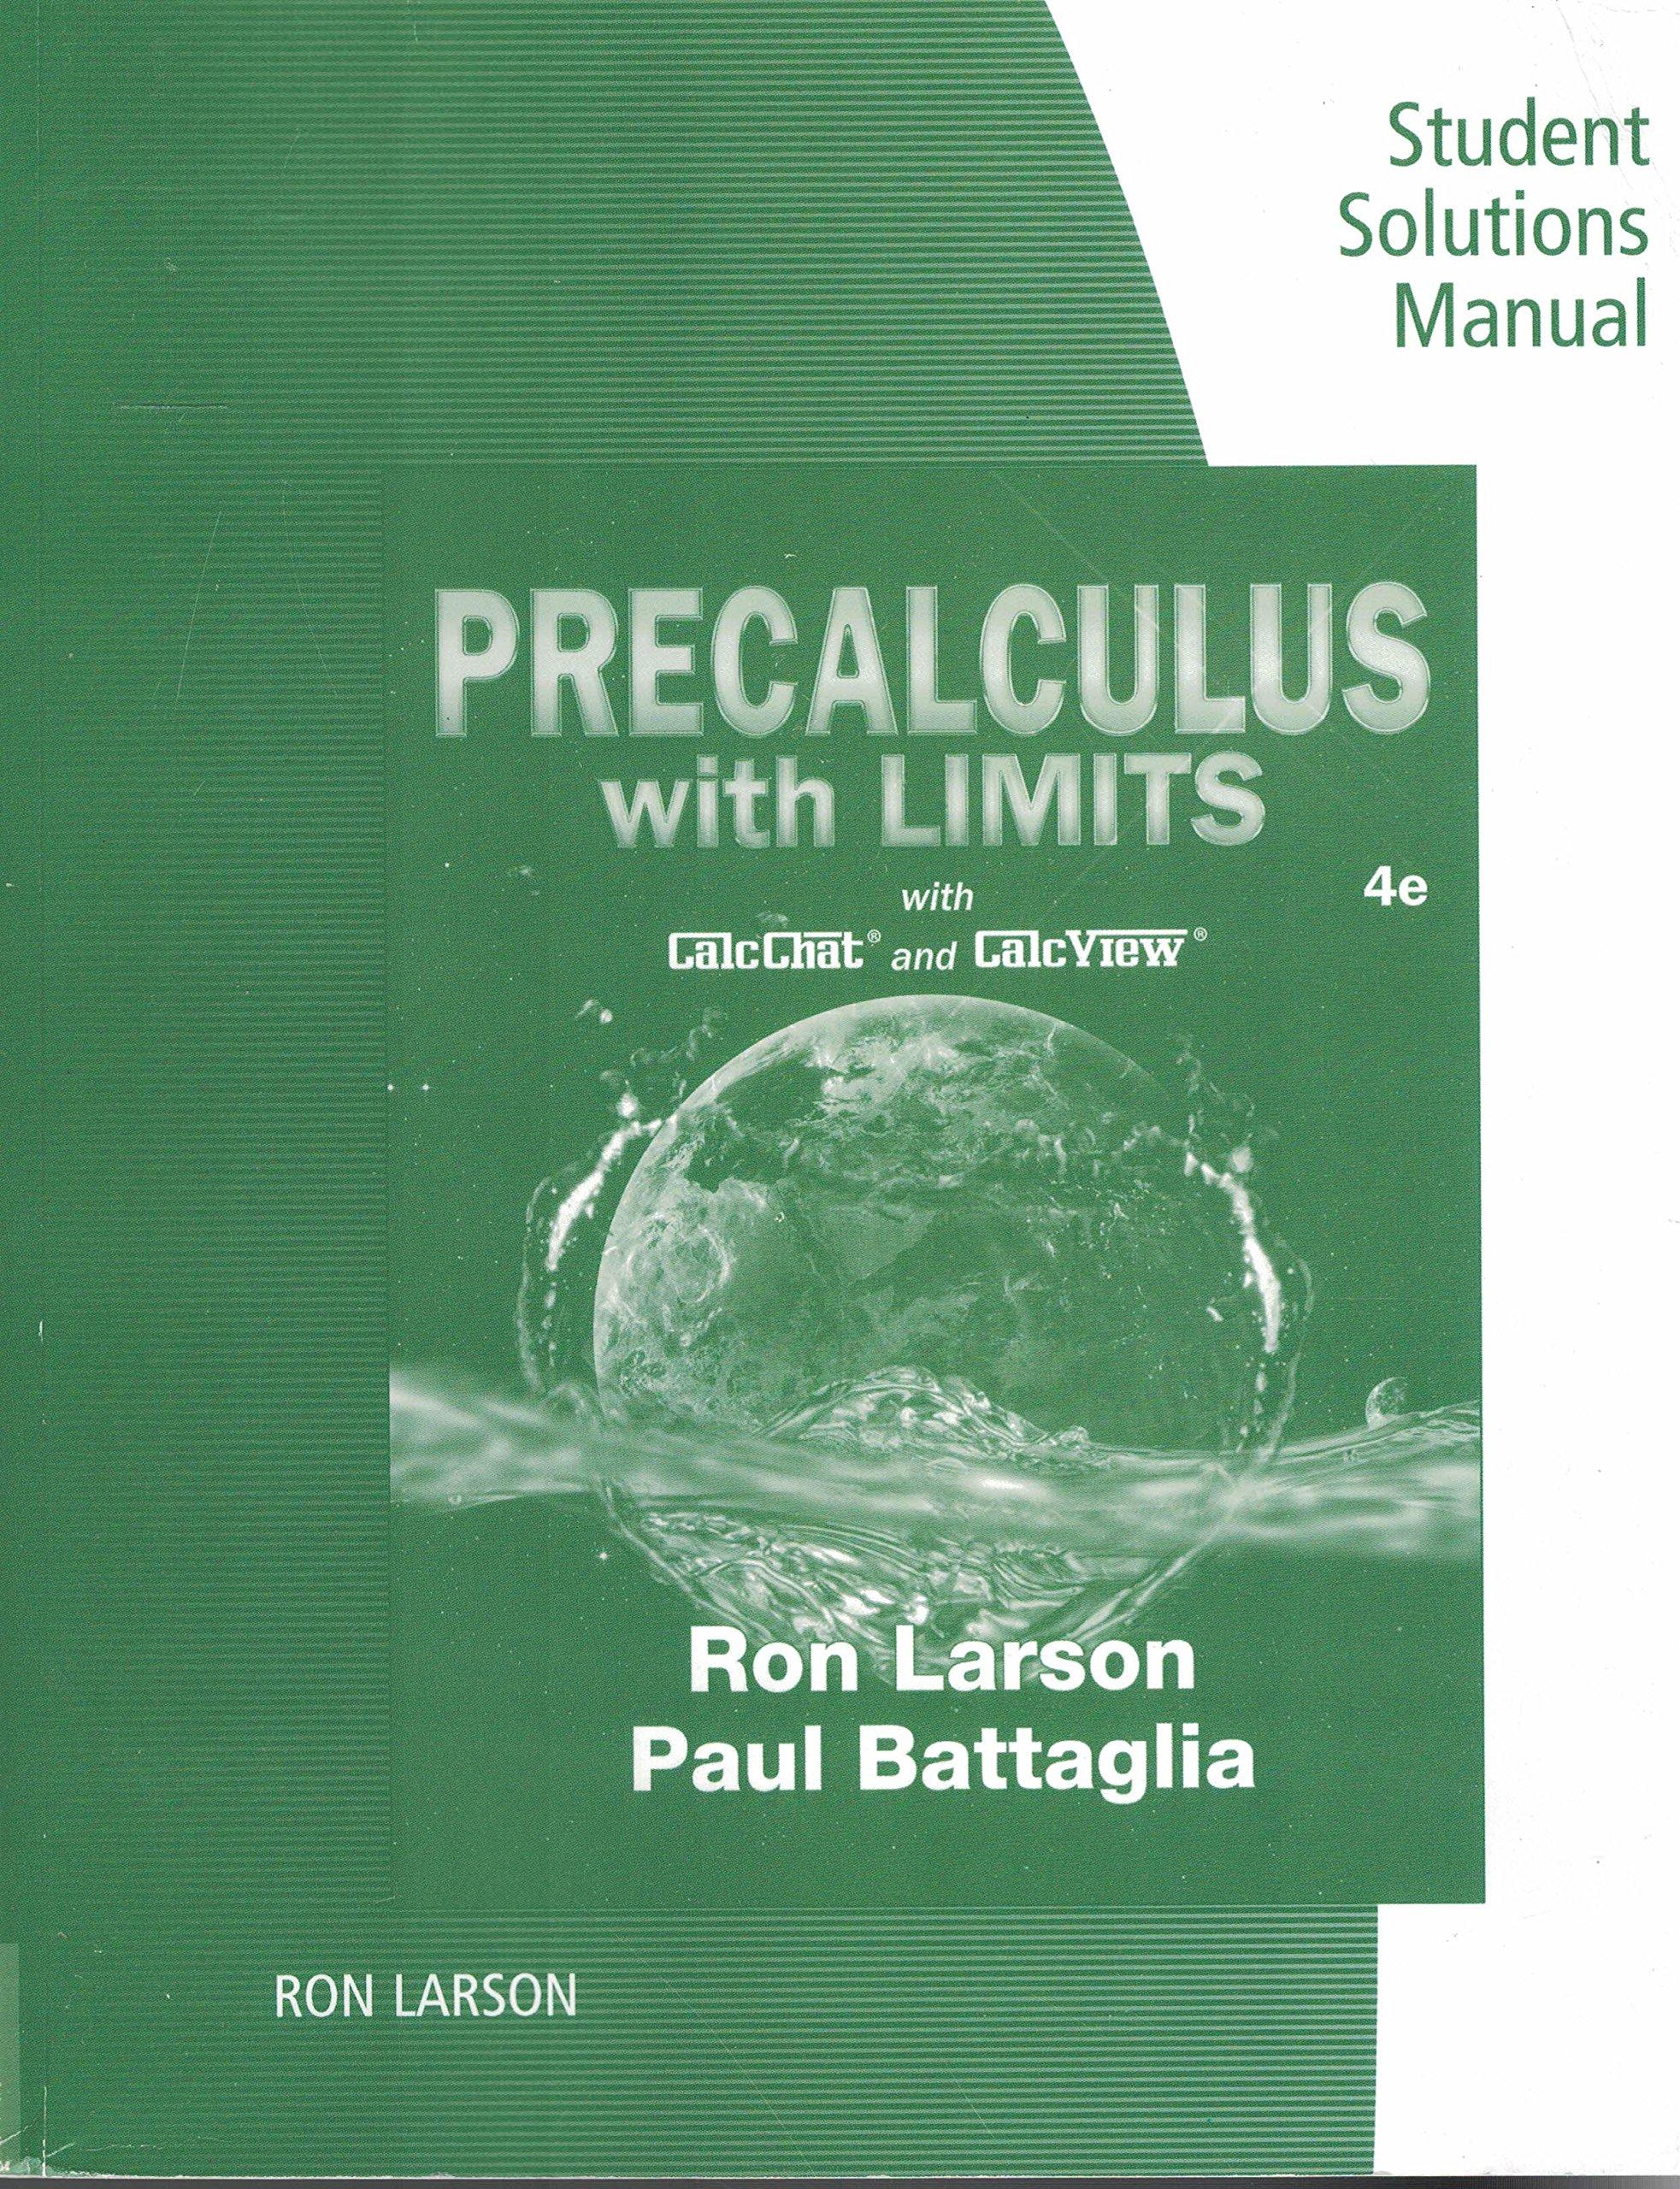 Precalculus with Limits, Student Solutions Manual, 4th edition: Ron Larson,  Paul Battaglia: 9781337279857: Amazon.com: Books